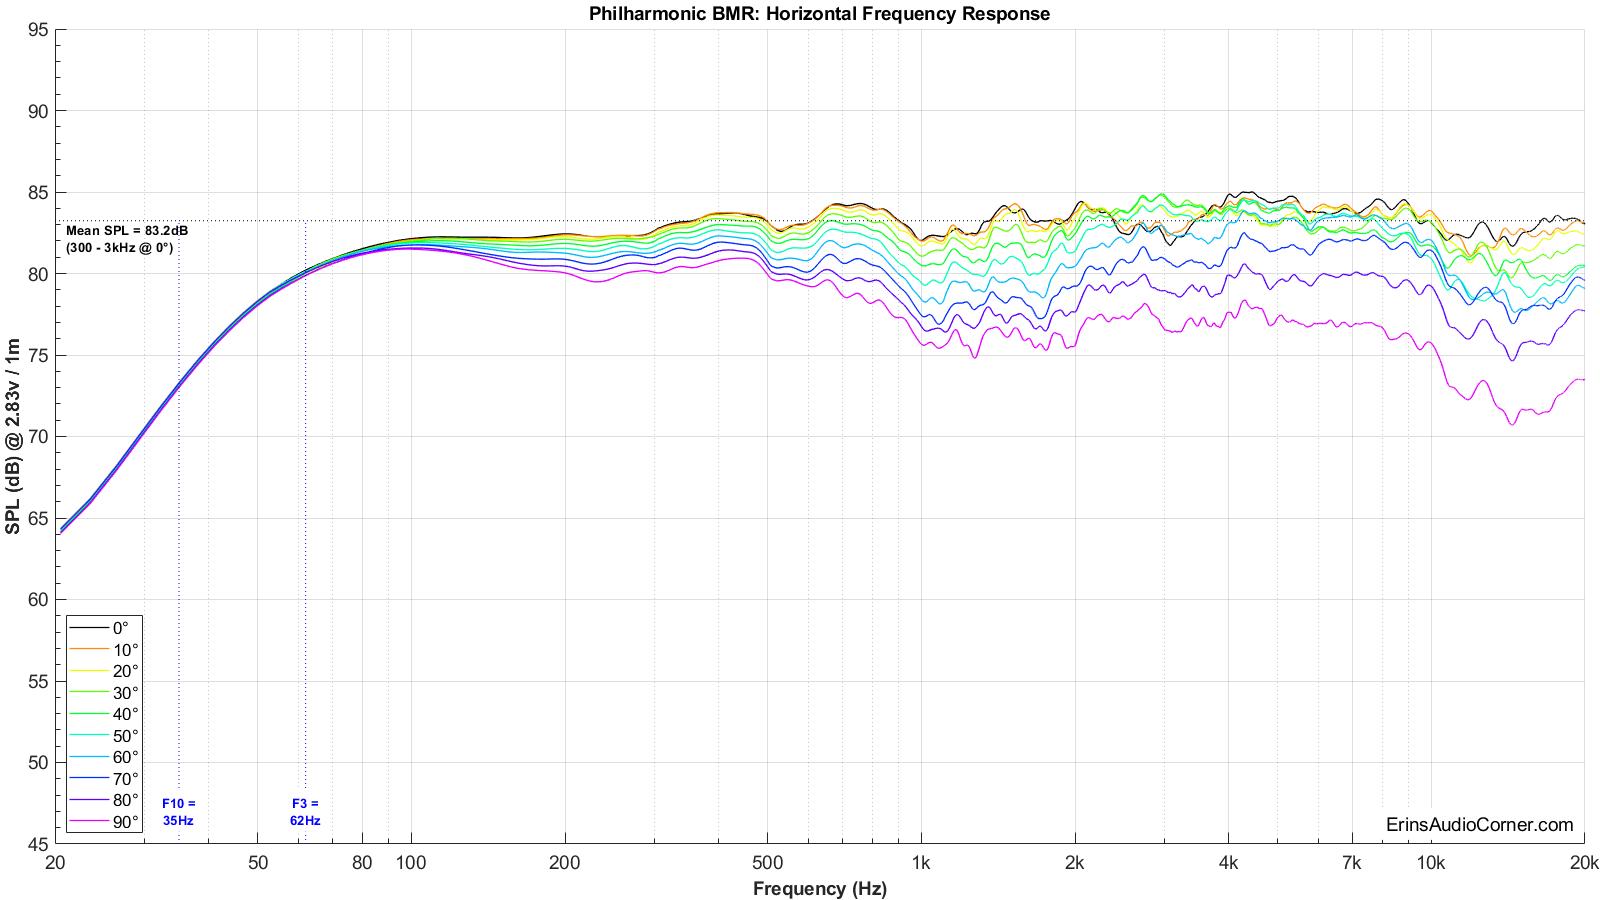 Philharmonic%20BMR%20Horizontal%20FR.png